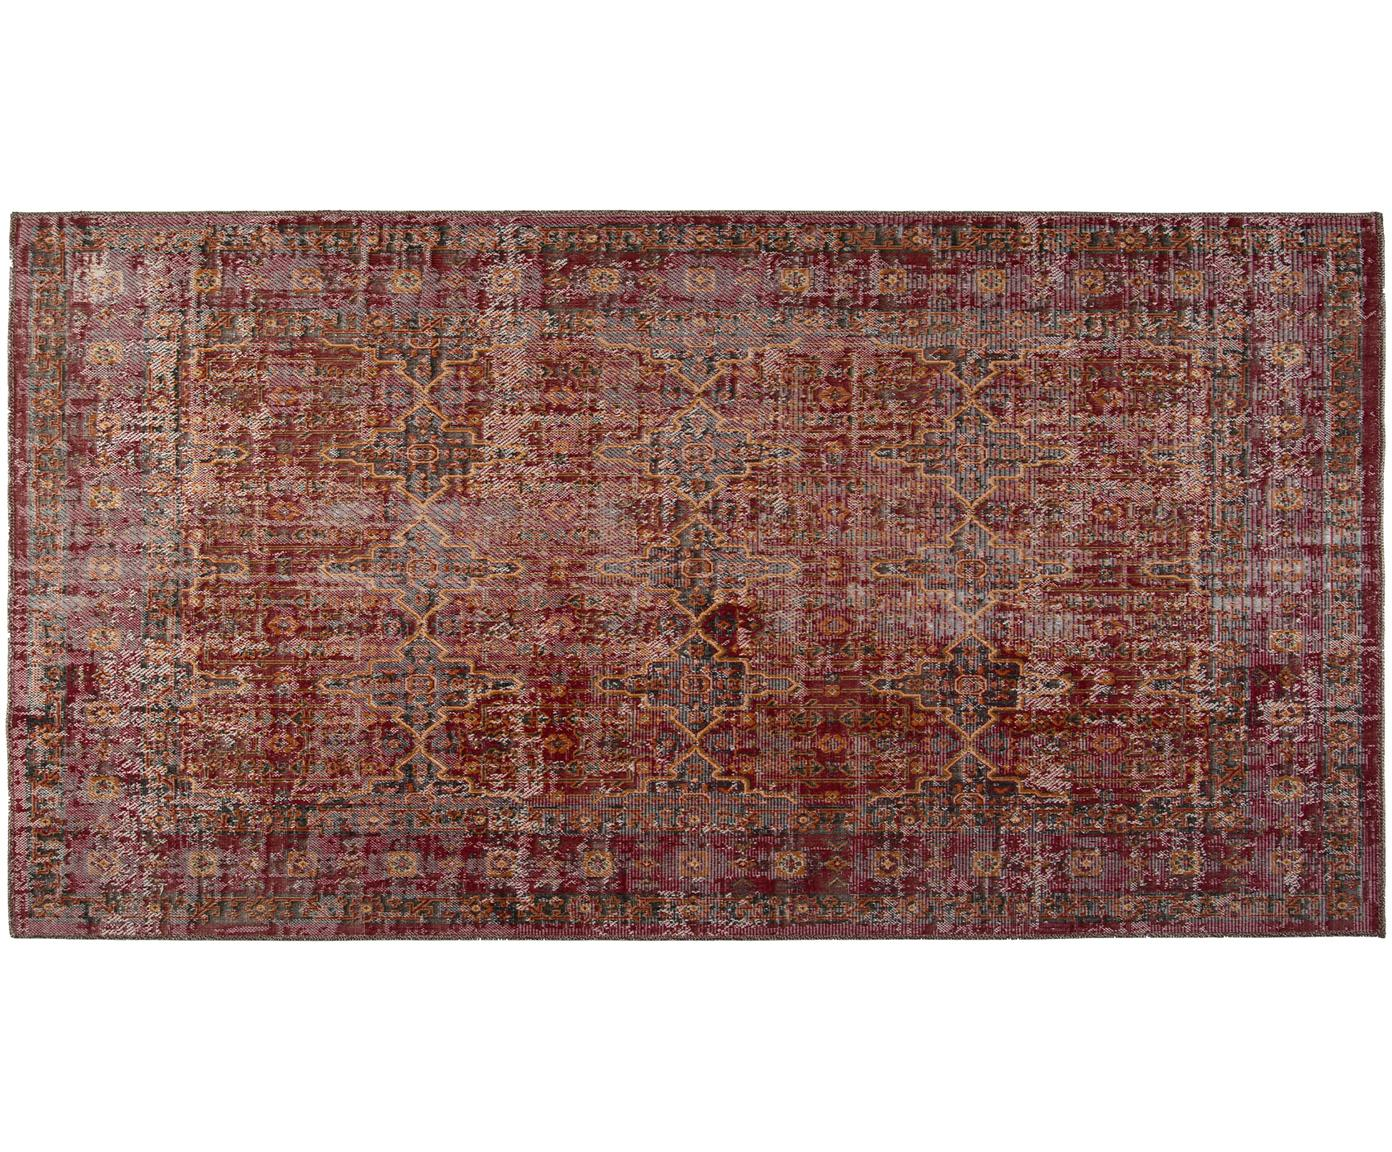 In- & Outdoor-Teppich Tilas Izmir in Dunkelrot, Orient Style, Dunkelrot, Senfgelb, Khaki, B 80 x L 150 cm (Größe XS)